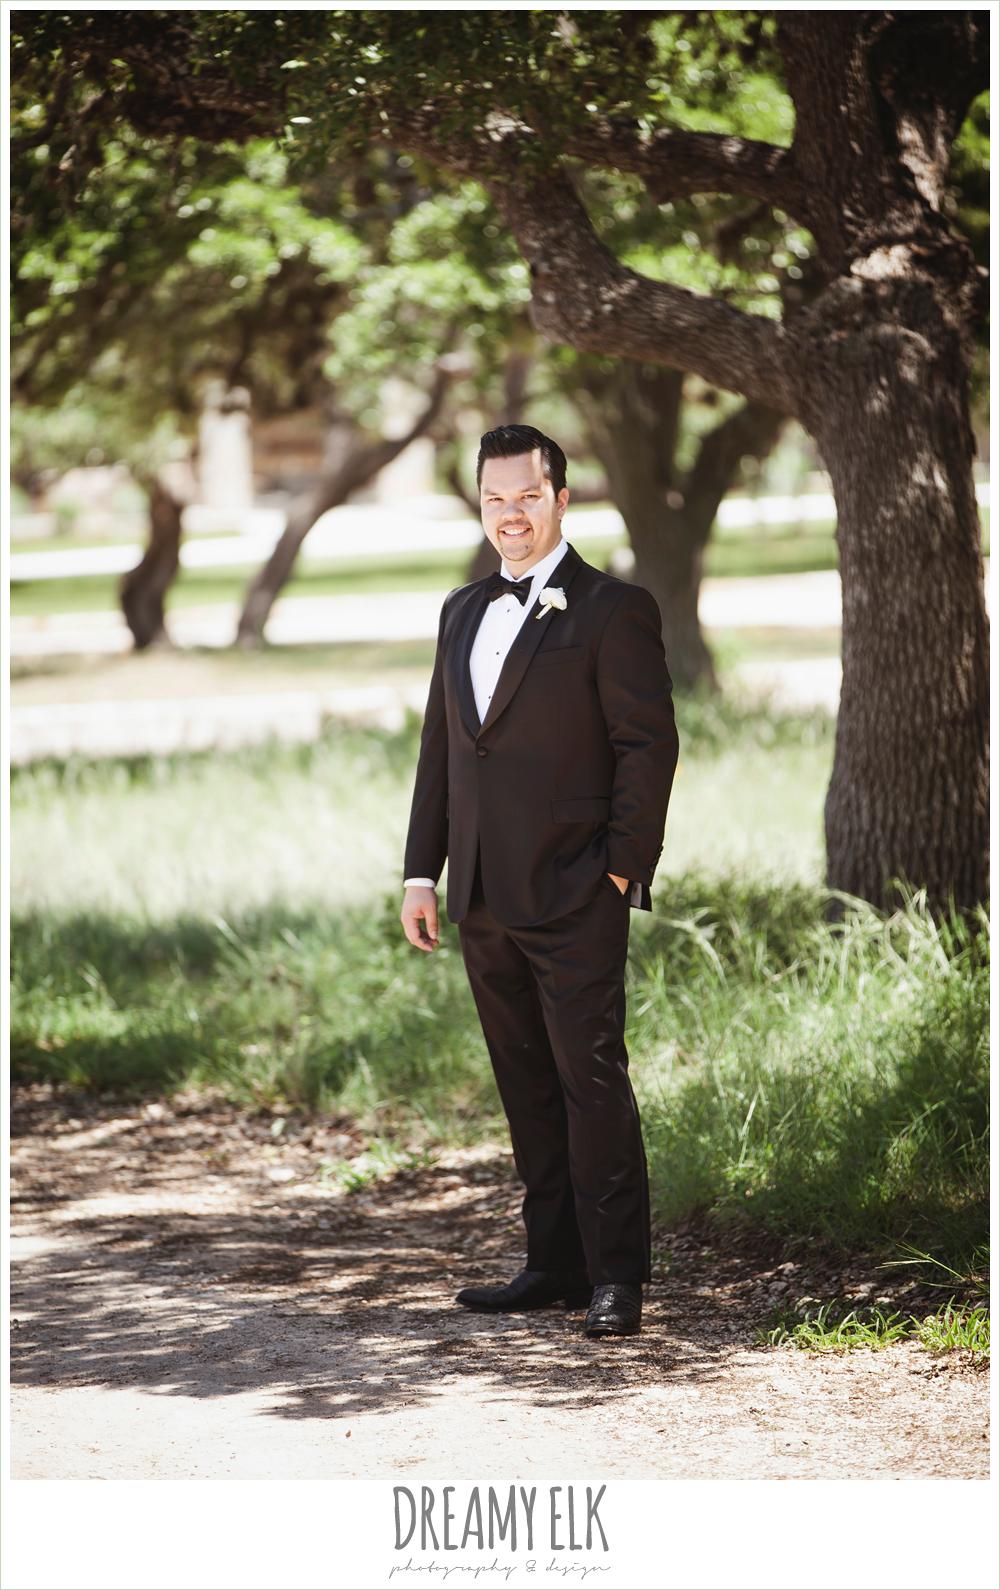 groom in tuxedo, la hacienda, dripping springs, texas {dreamy elk photography and design} photo